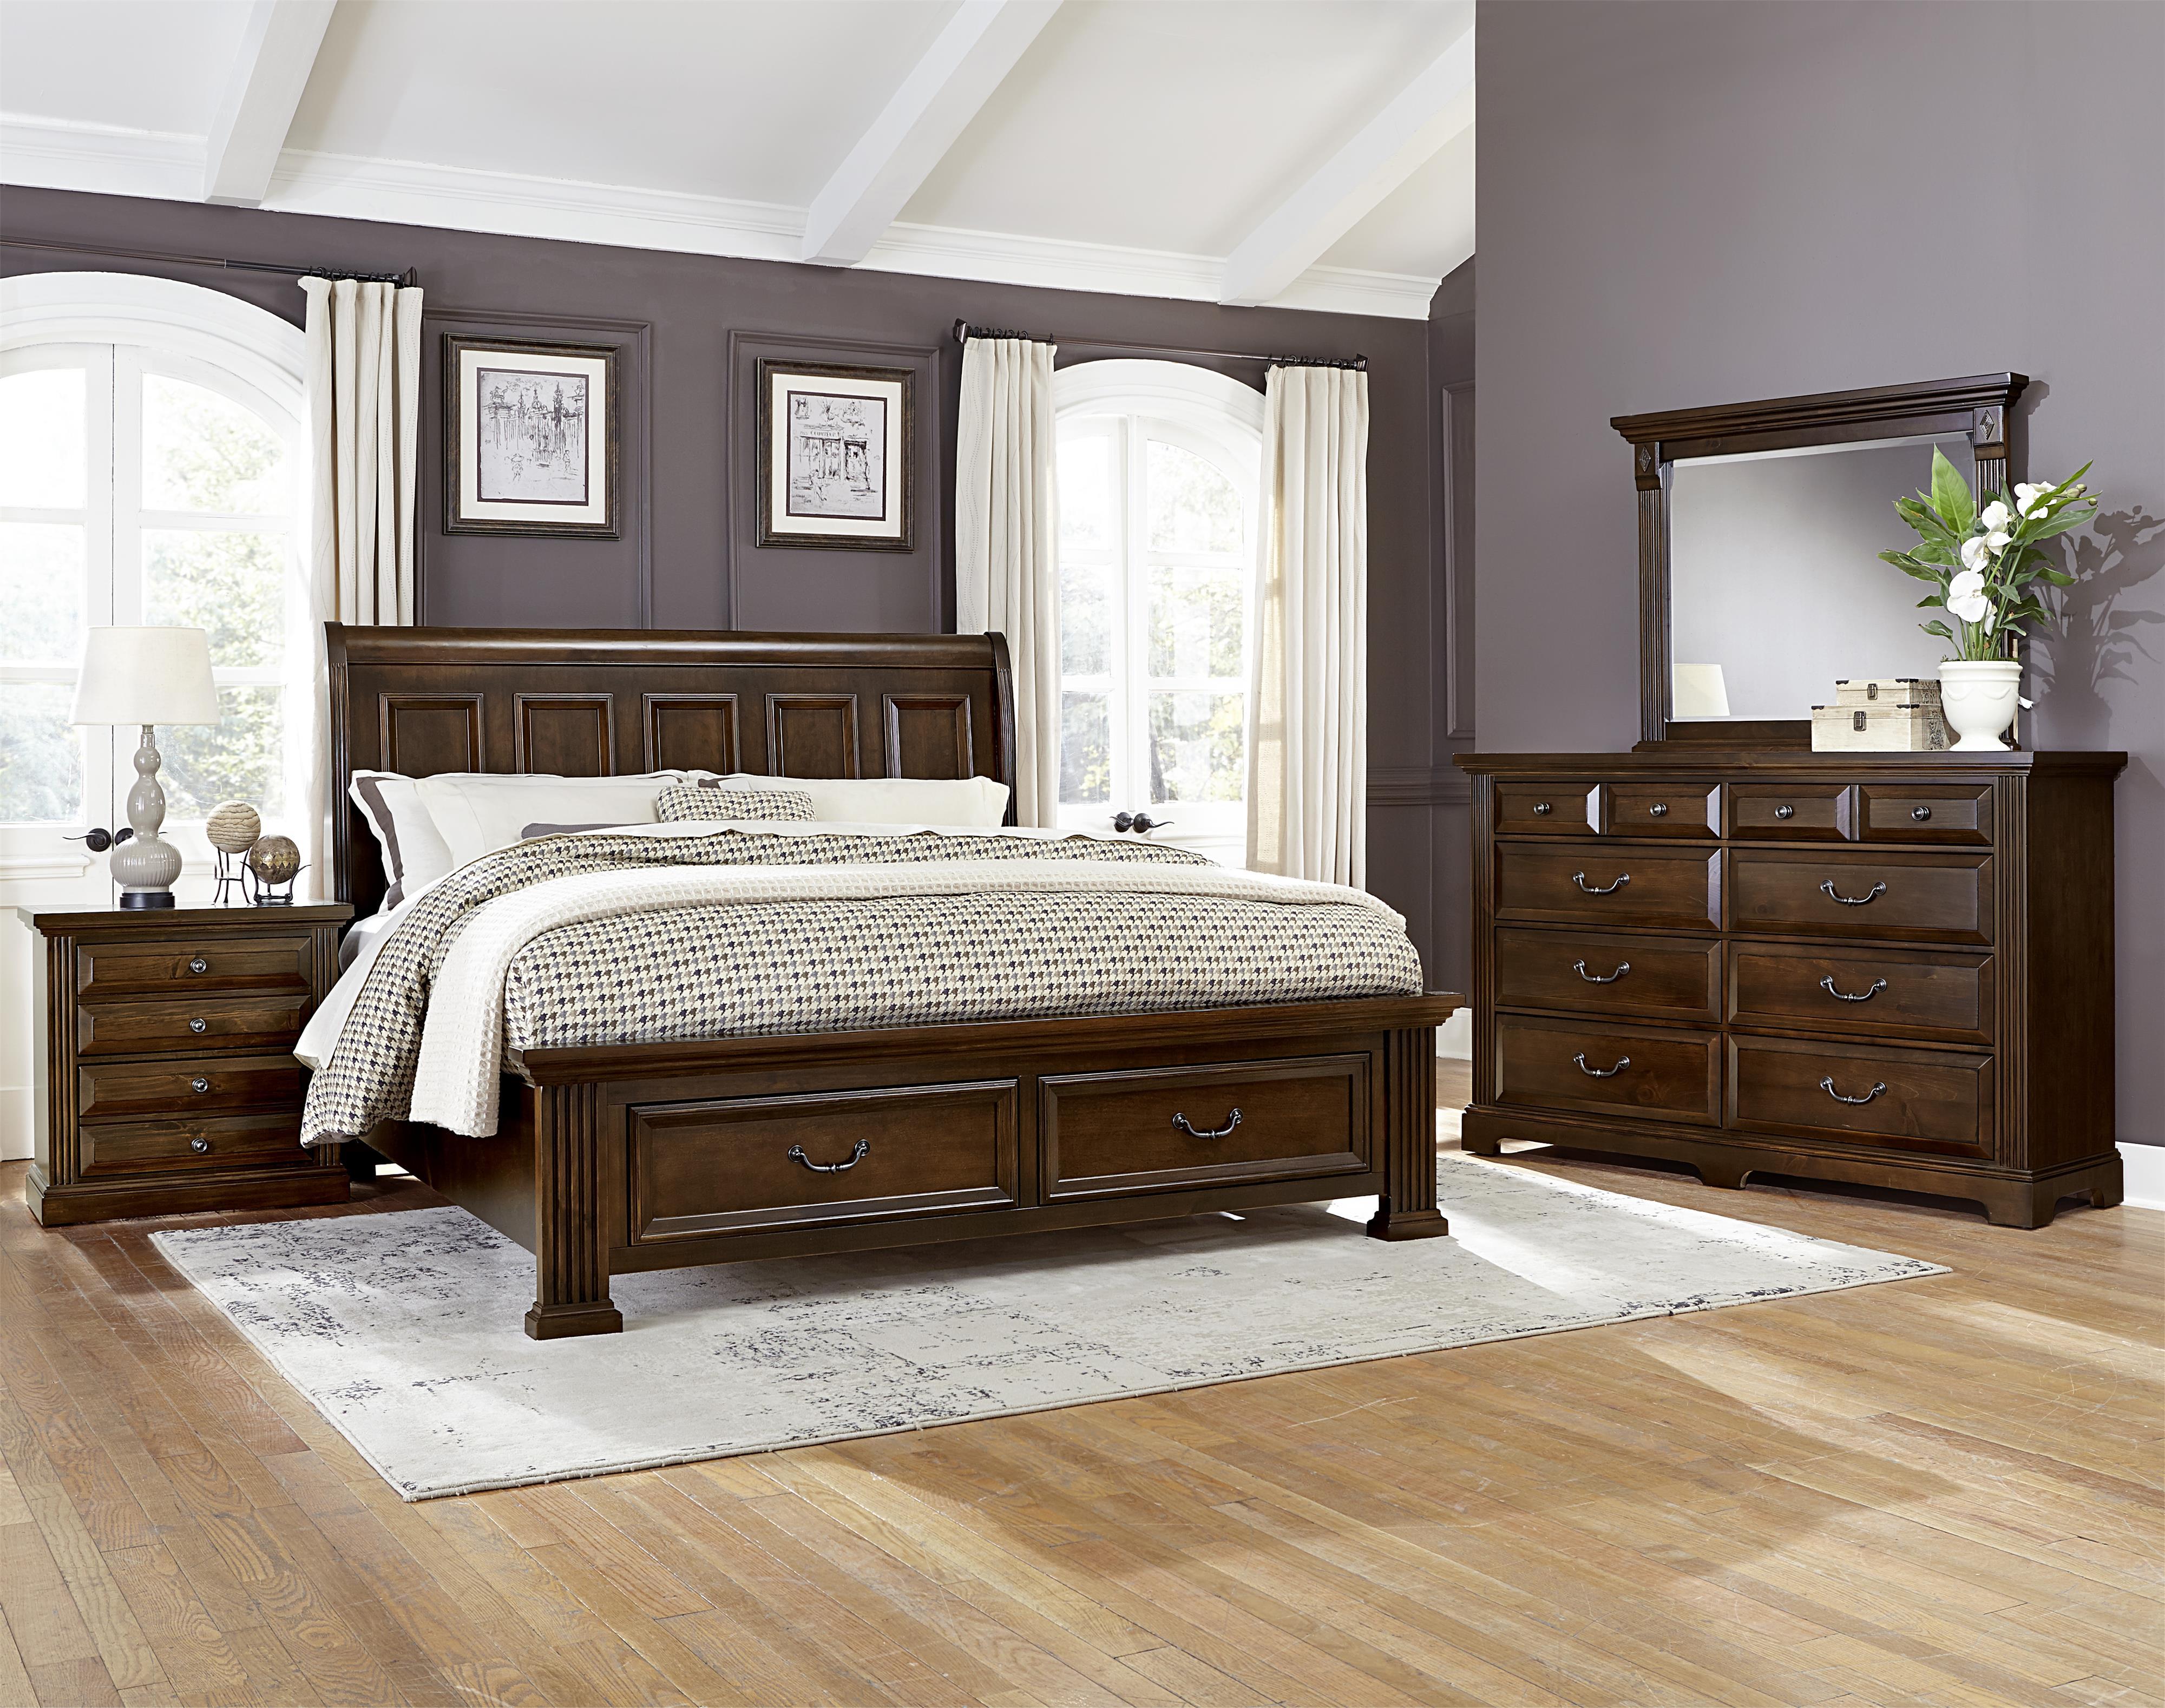 Vaughan bassett woodlands king bedroom group olinde 39 s for Bassett bedroom furniture